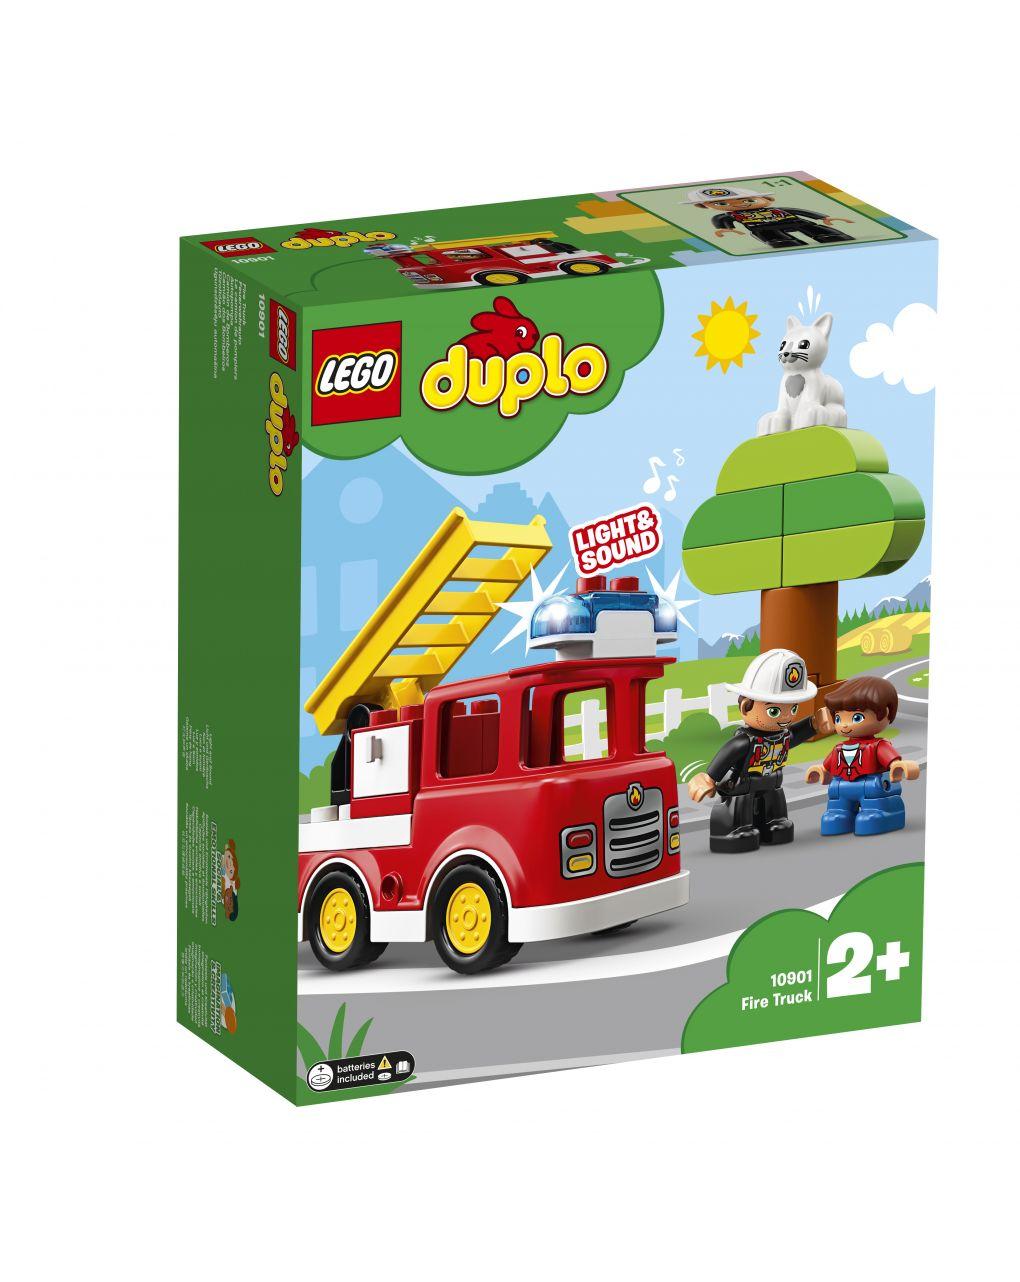 Duplo - autopompa - 10901 - LEGO Duplo